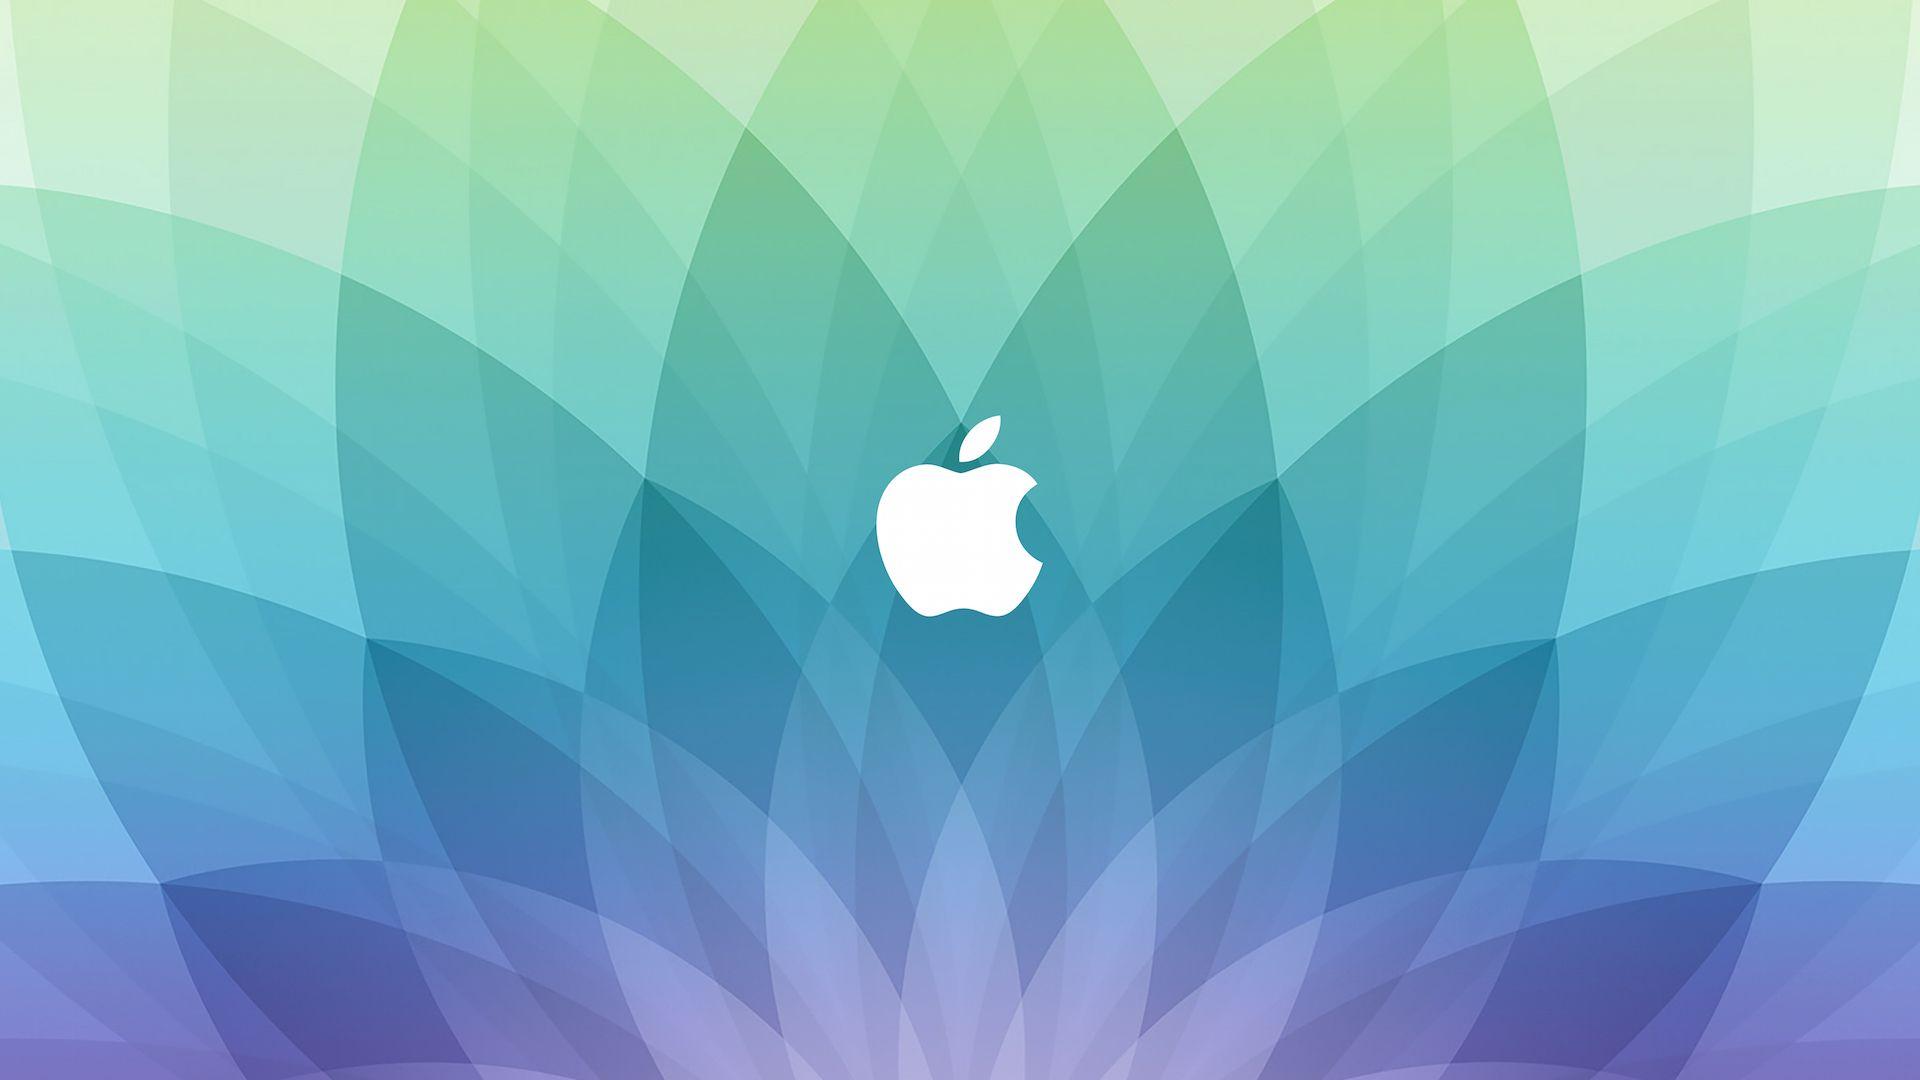 Wallpaper Iphone 6 Apple